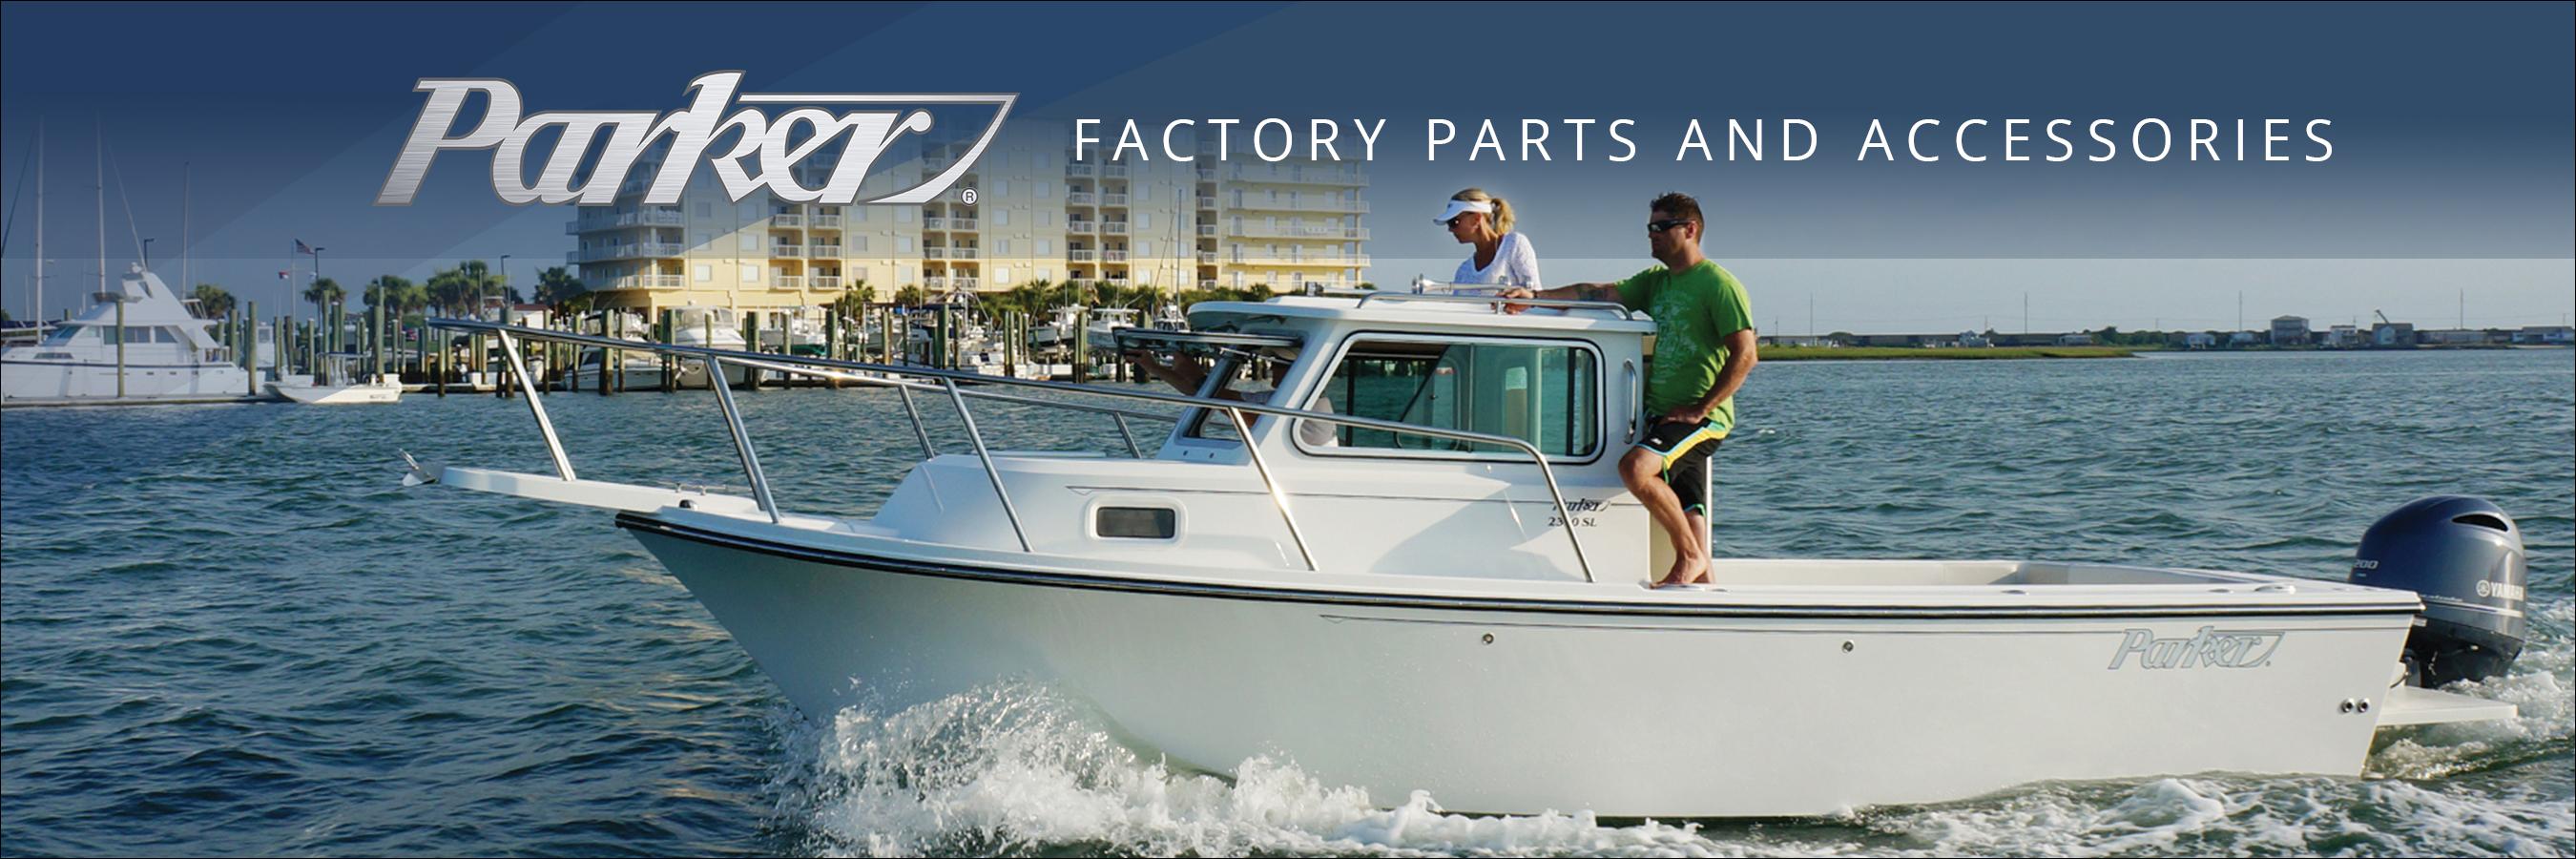 Parker Boat Parts